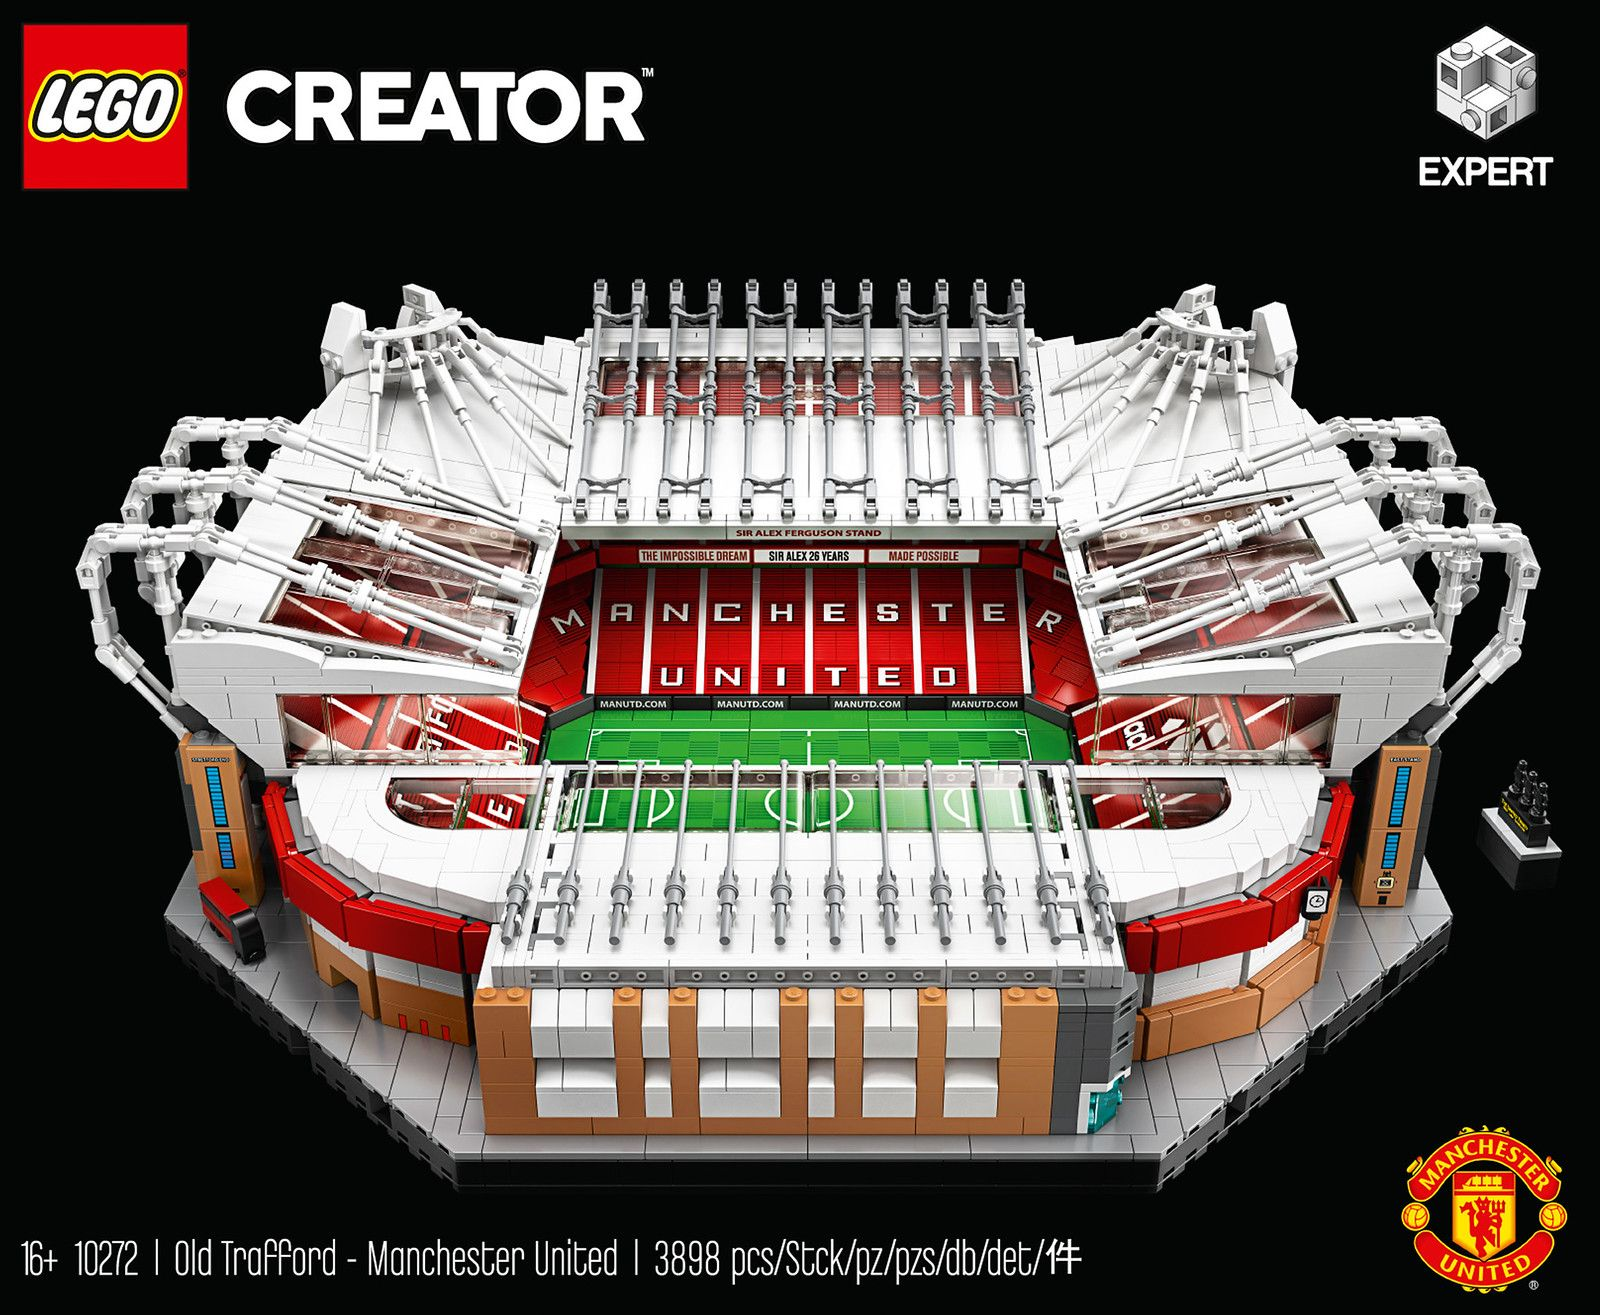 Lego 10272 Old Trafford Manchester United L Annonce Officielle Hellobricks In 2020 Lego Sets Big Lego Sets Old Trafford